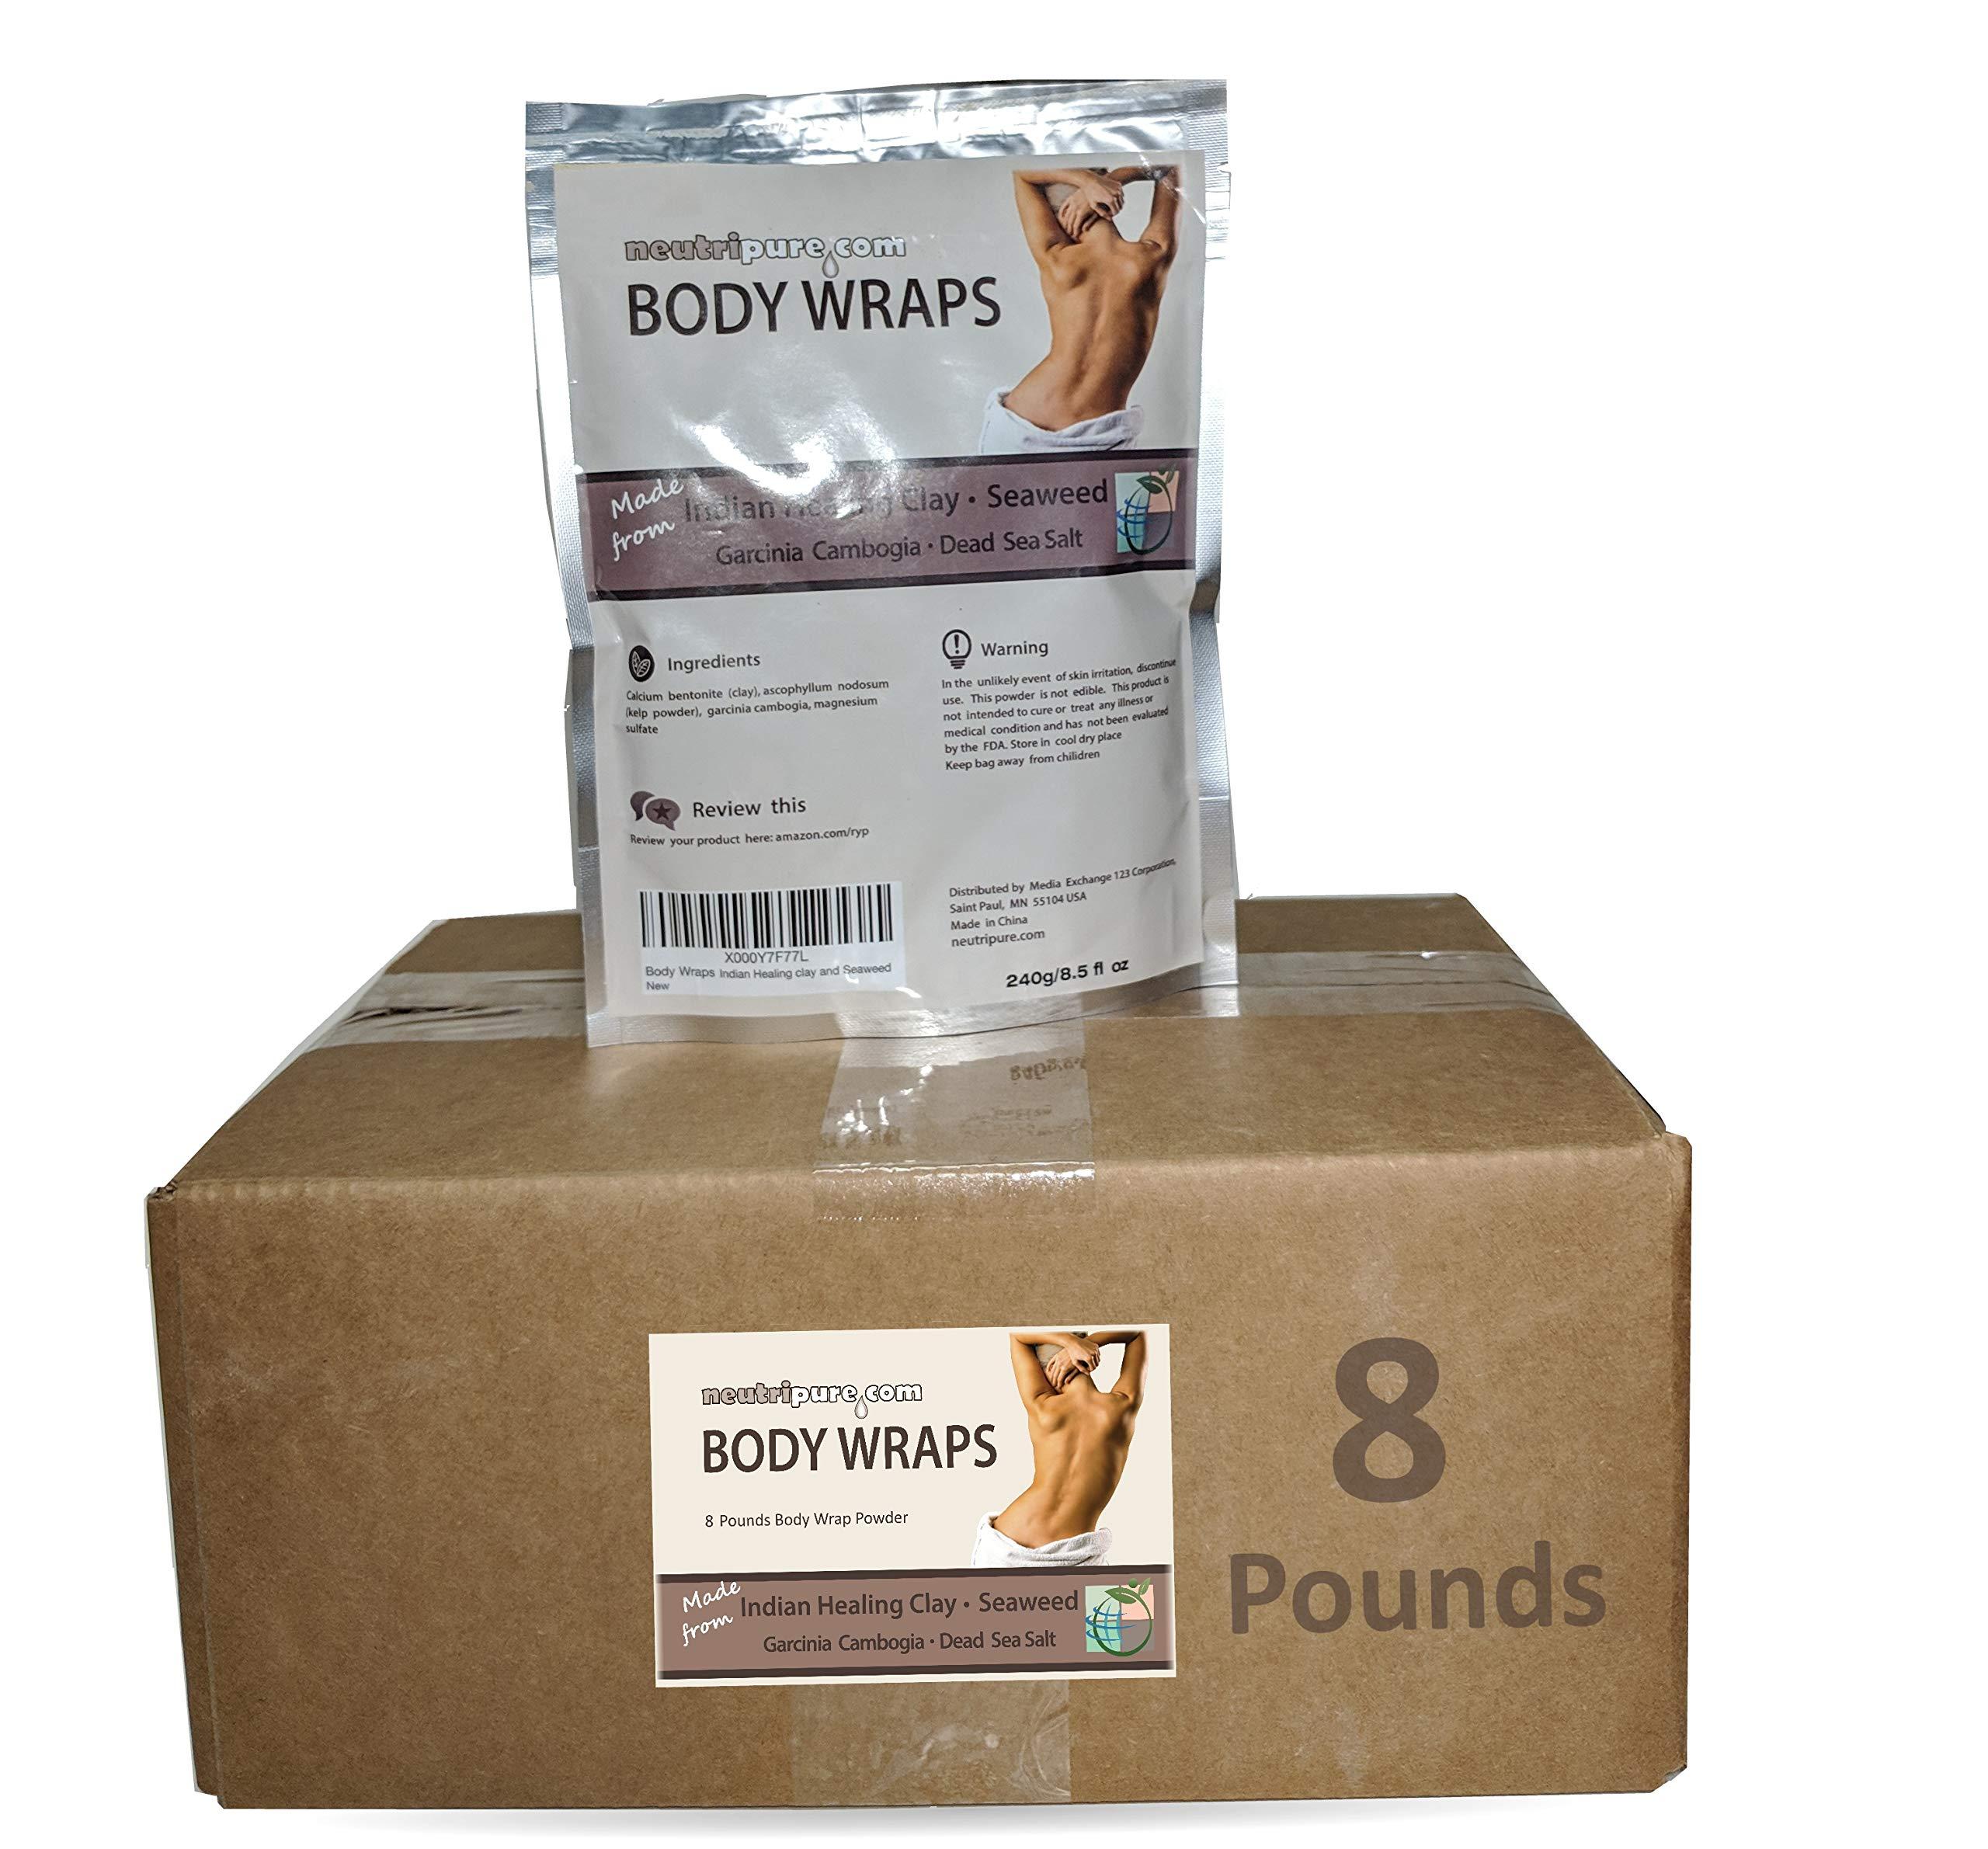 Neutripure SPA Formula Body Wrap Bulk 8 Pounds: Seaweed, Healing Clay, Garcinia Cambogia, and Dead Sea Salt